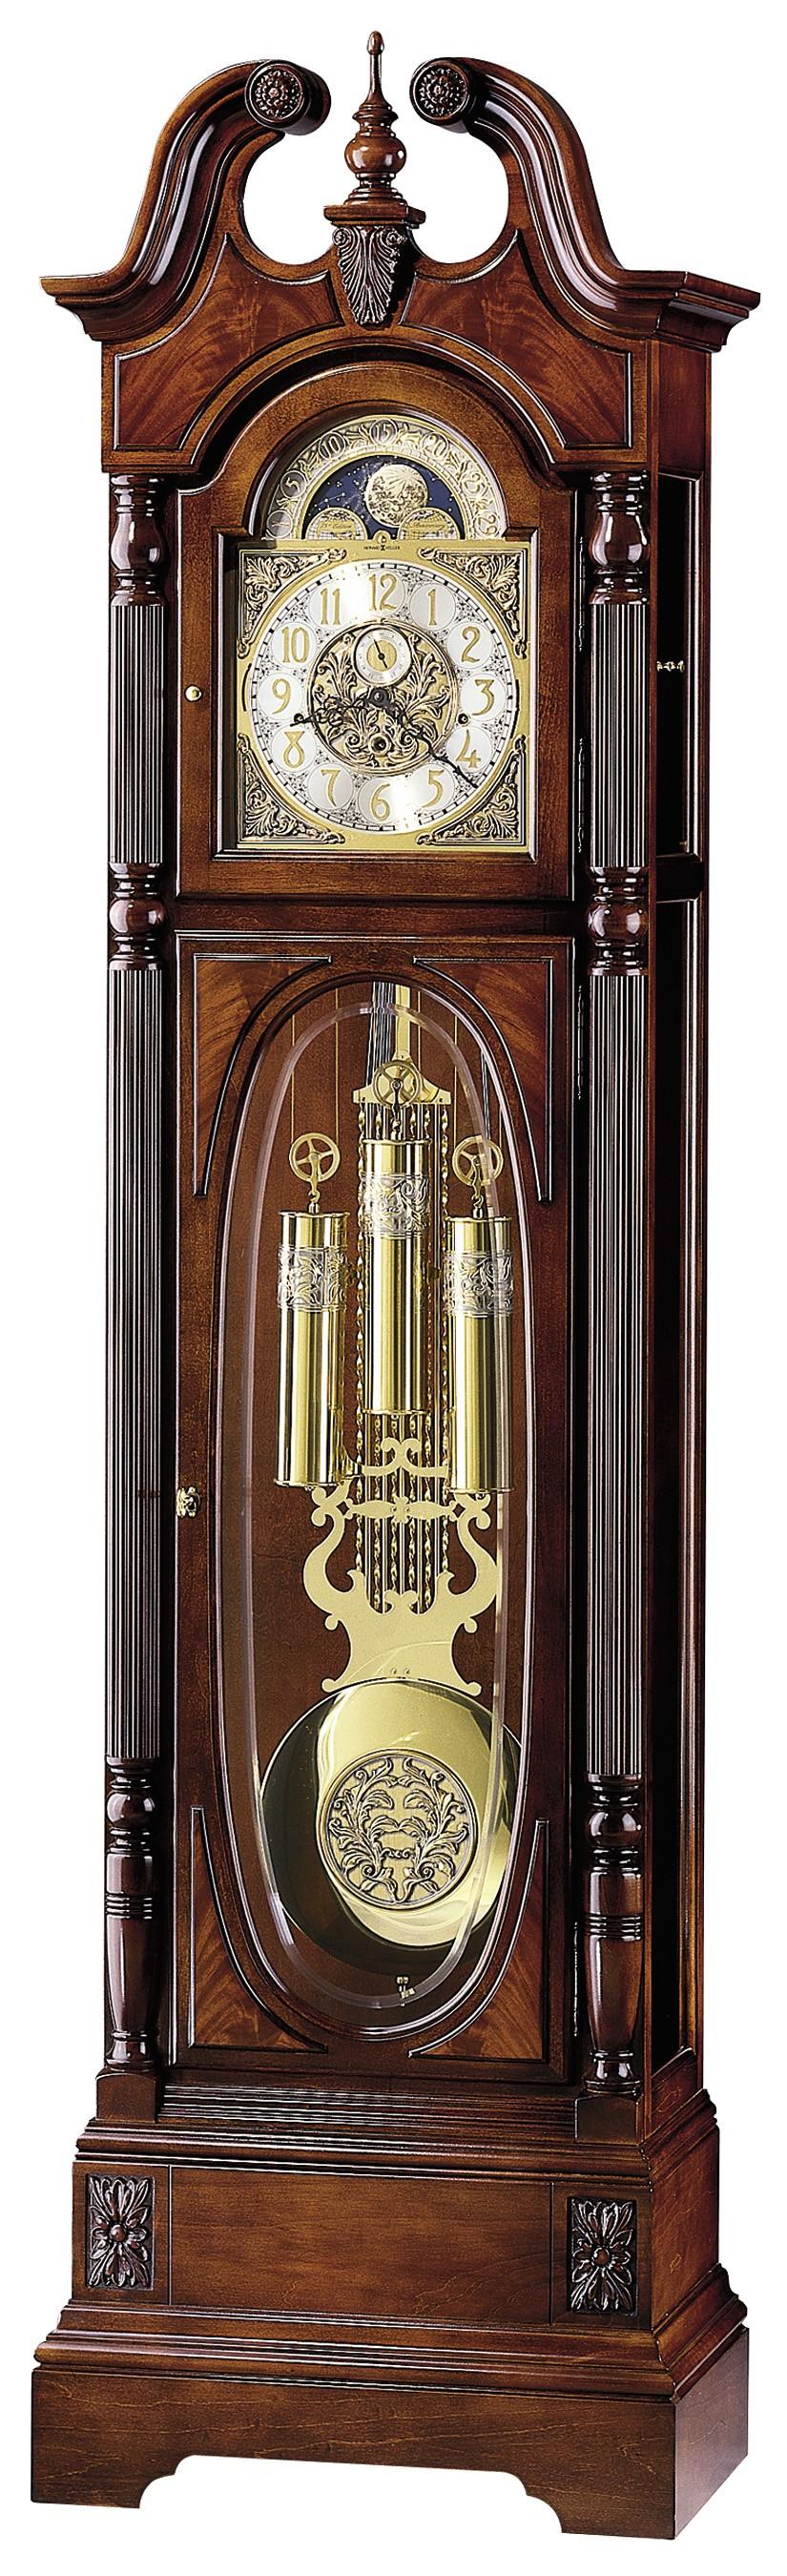 Howard Miller Clocks | Howard Miller STEWART 610-948 Grandfather Clock